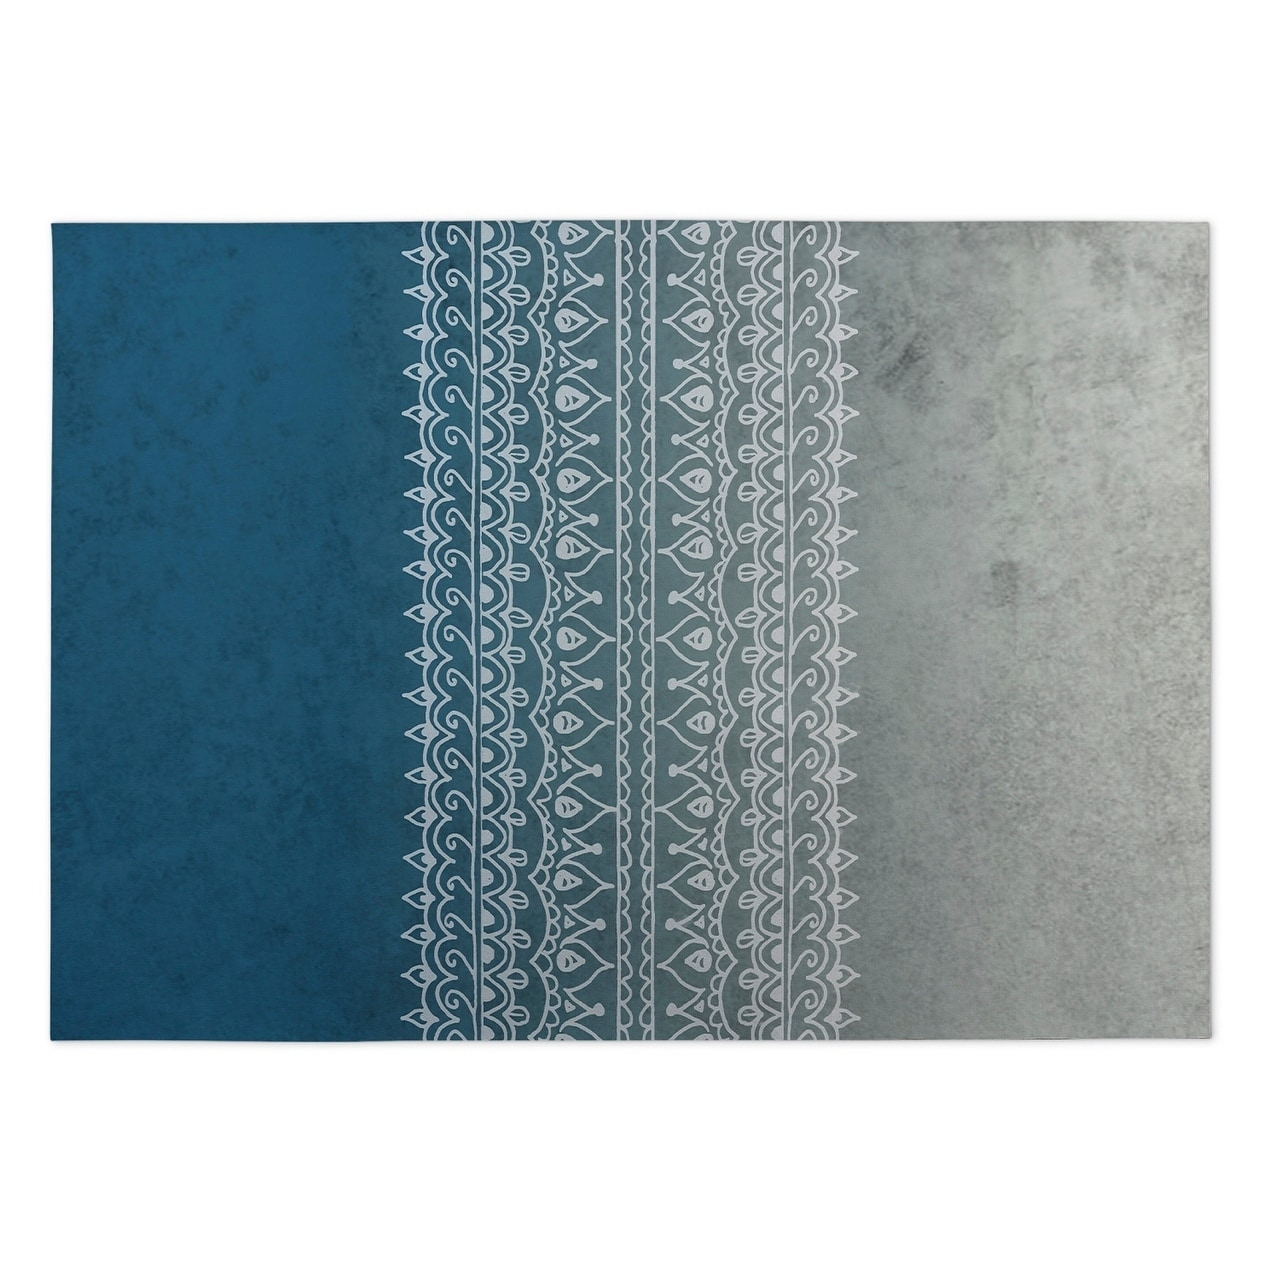 Kavka Designs Grey/ Blue Apostrophe 2 x 3 Indoor/ Outdoor Floor Mat (Grey - N/A - Modern & Contemporary)